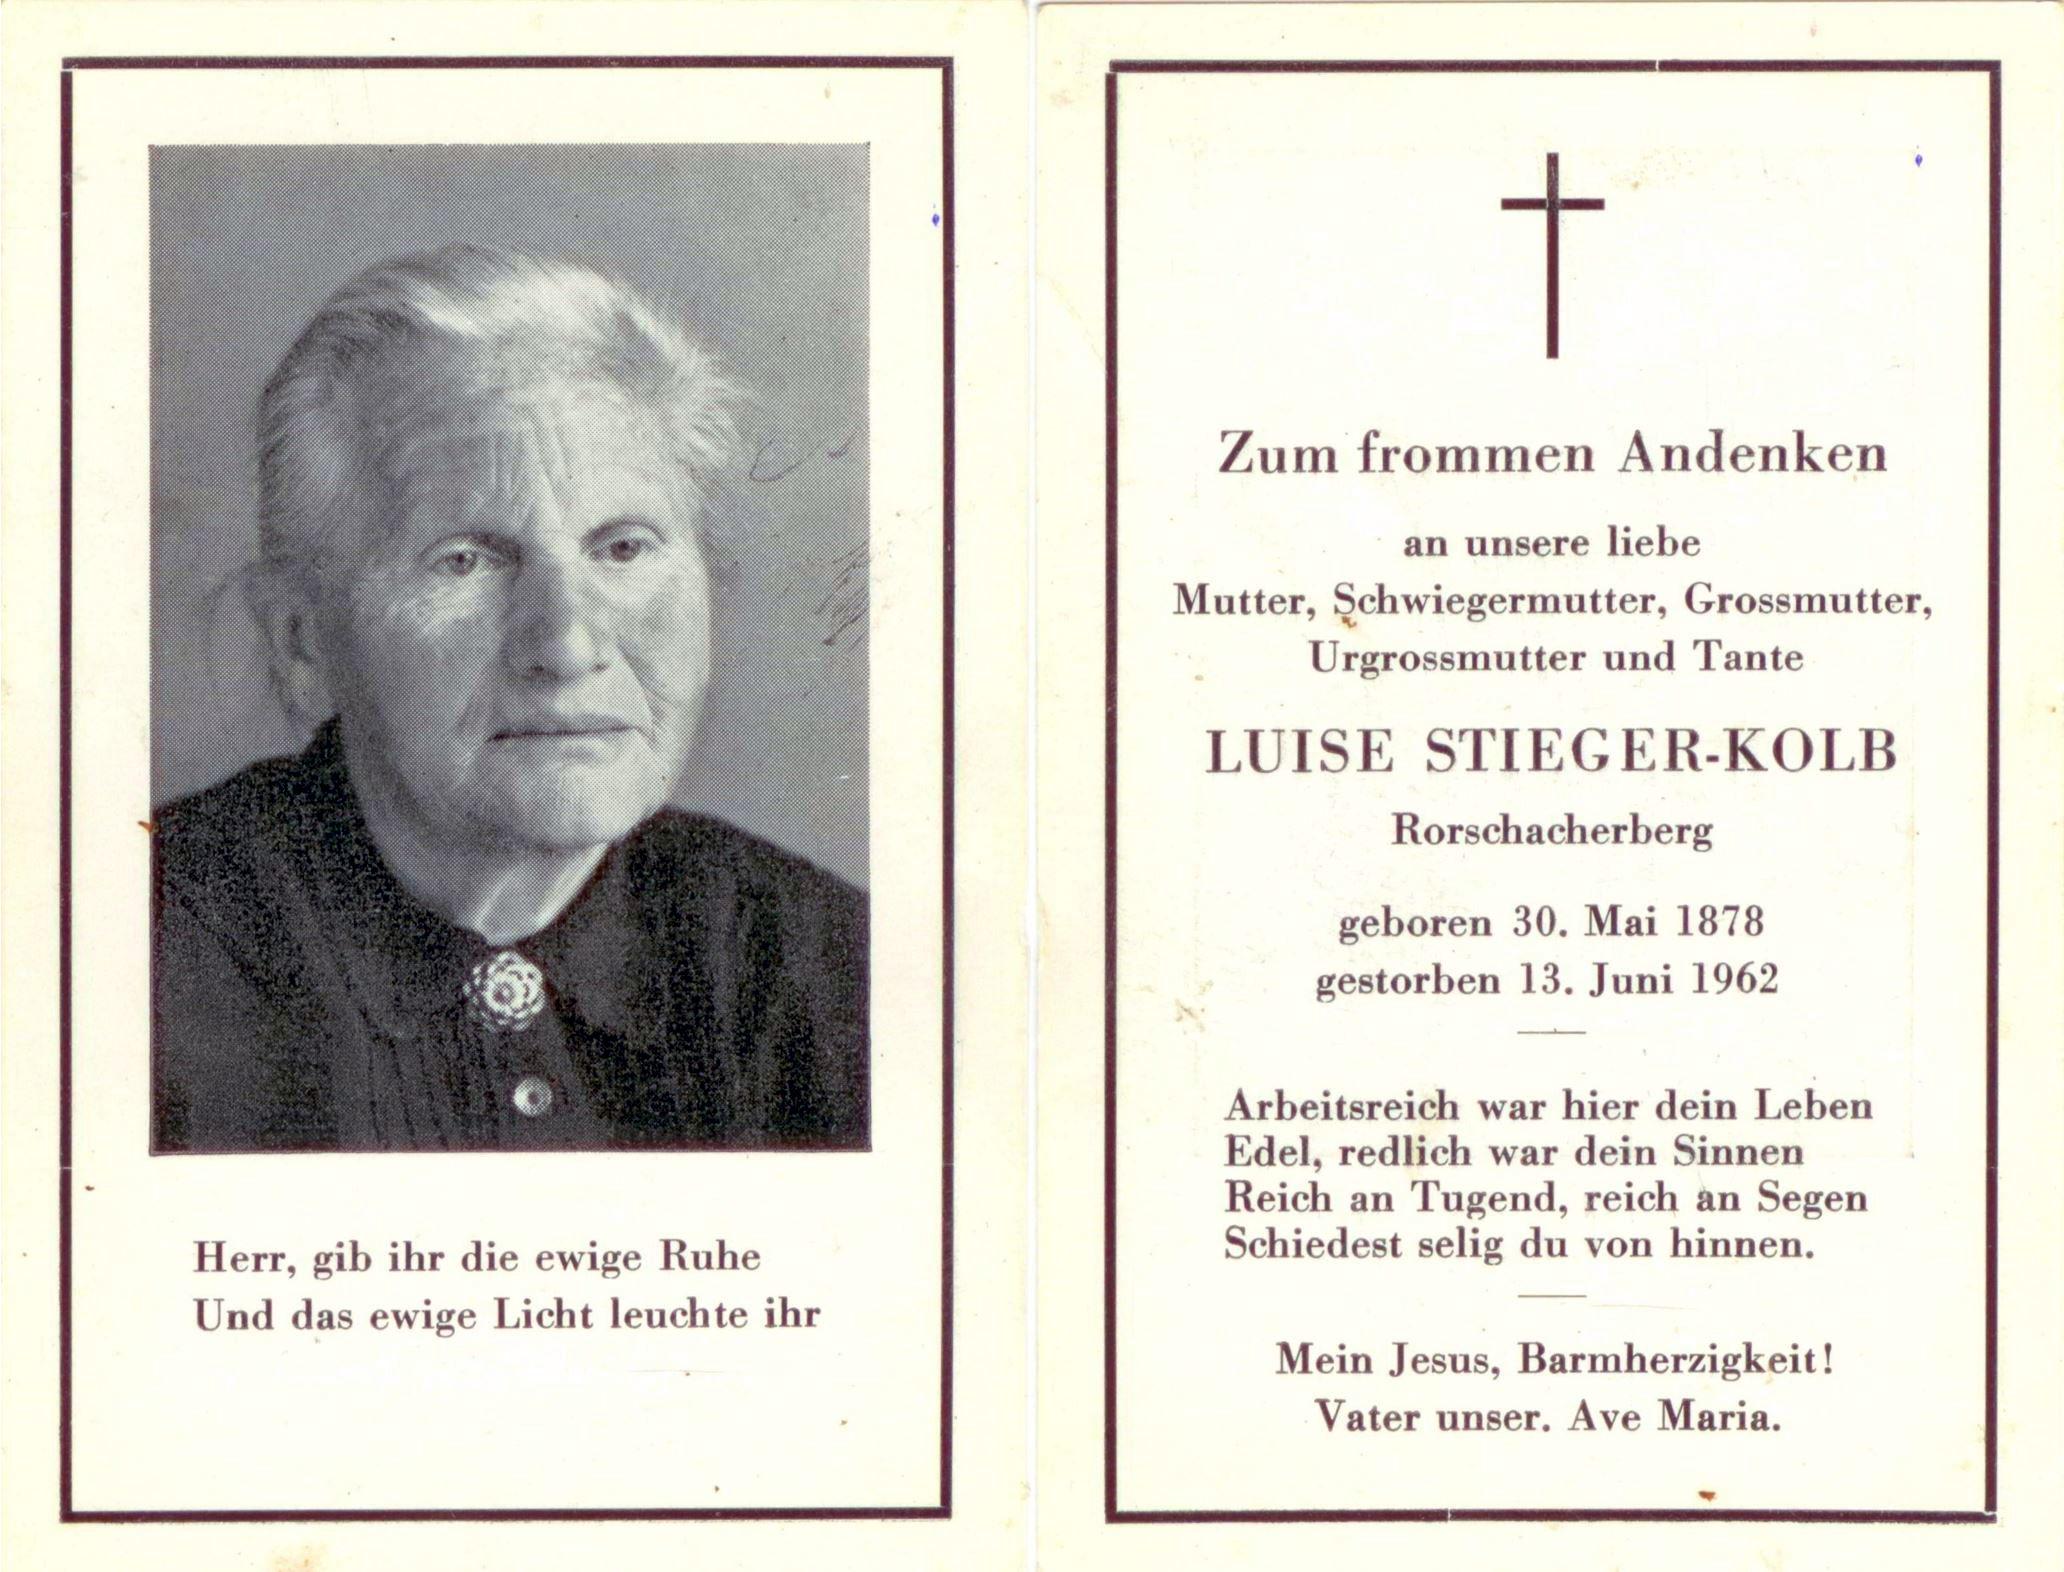 Luise Stieger-Kolb (1878-1962)